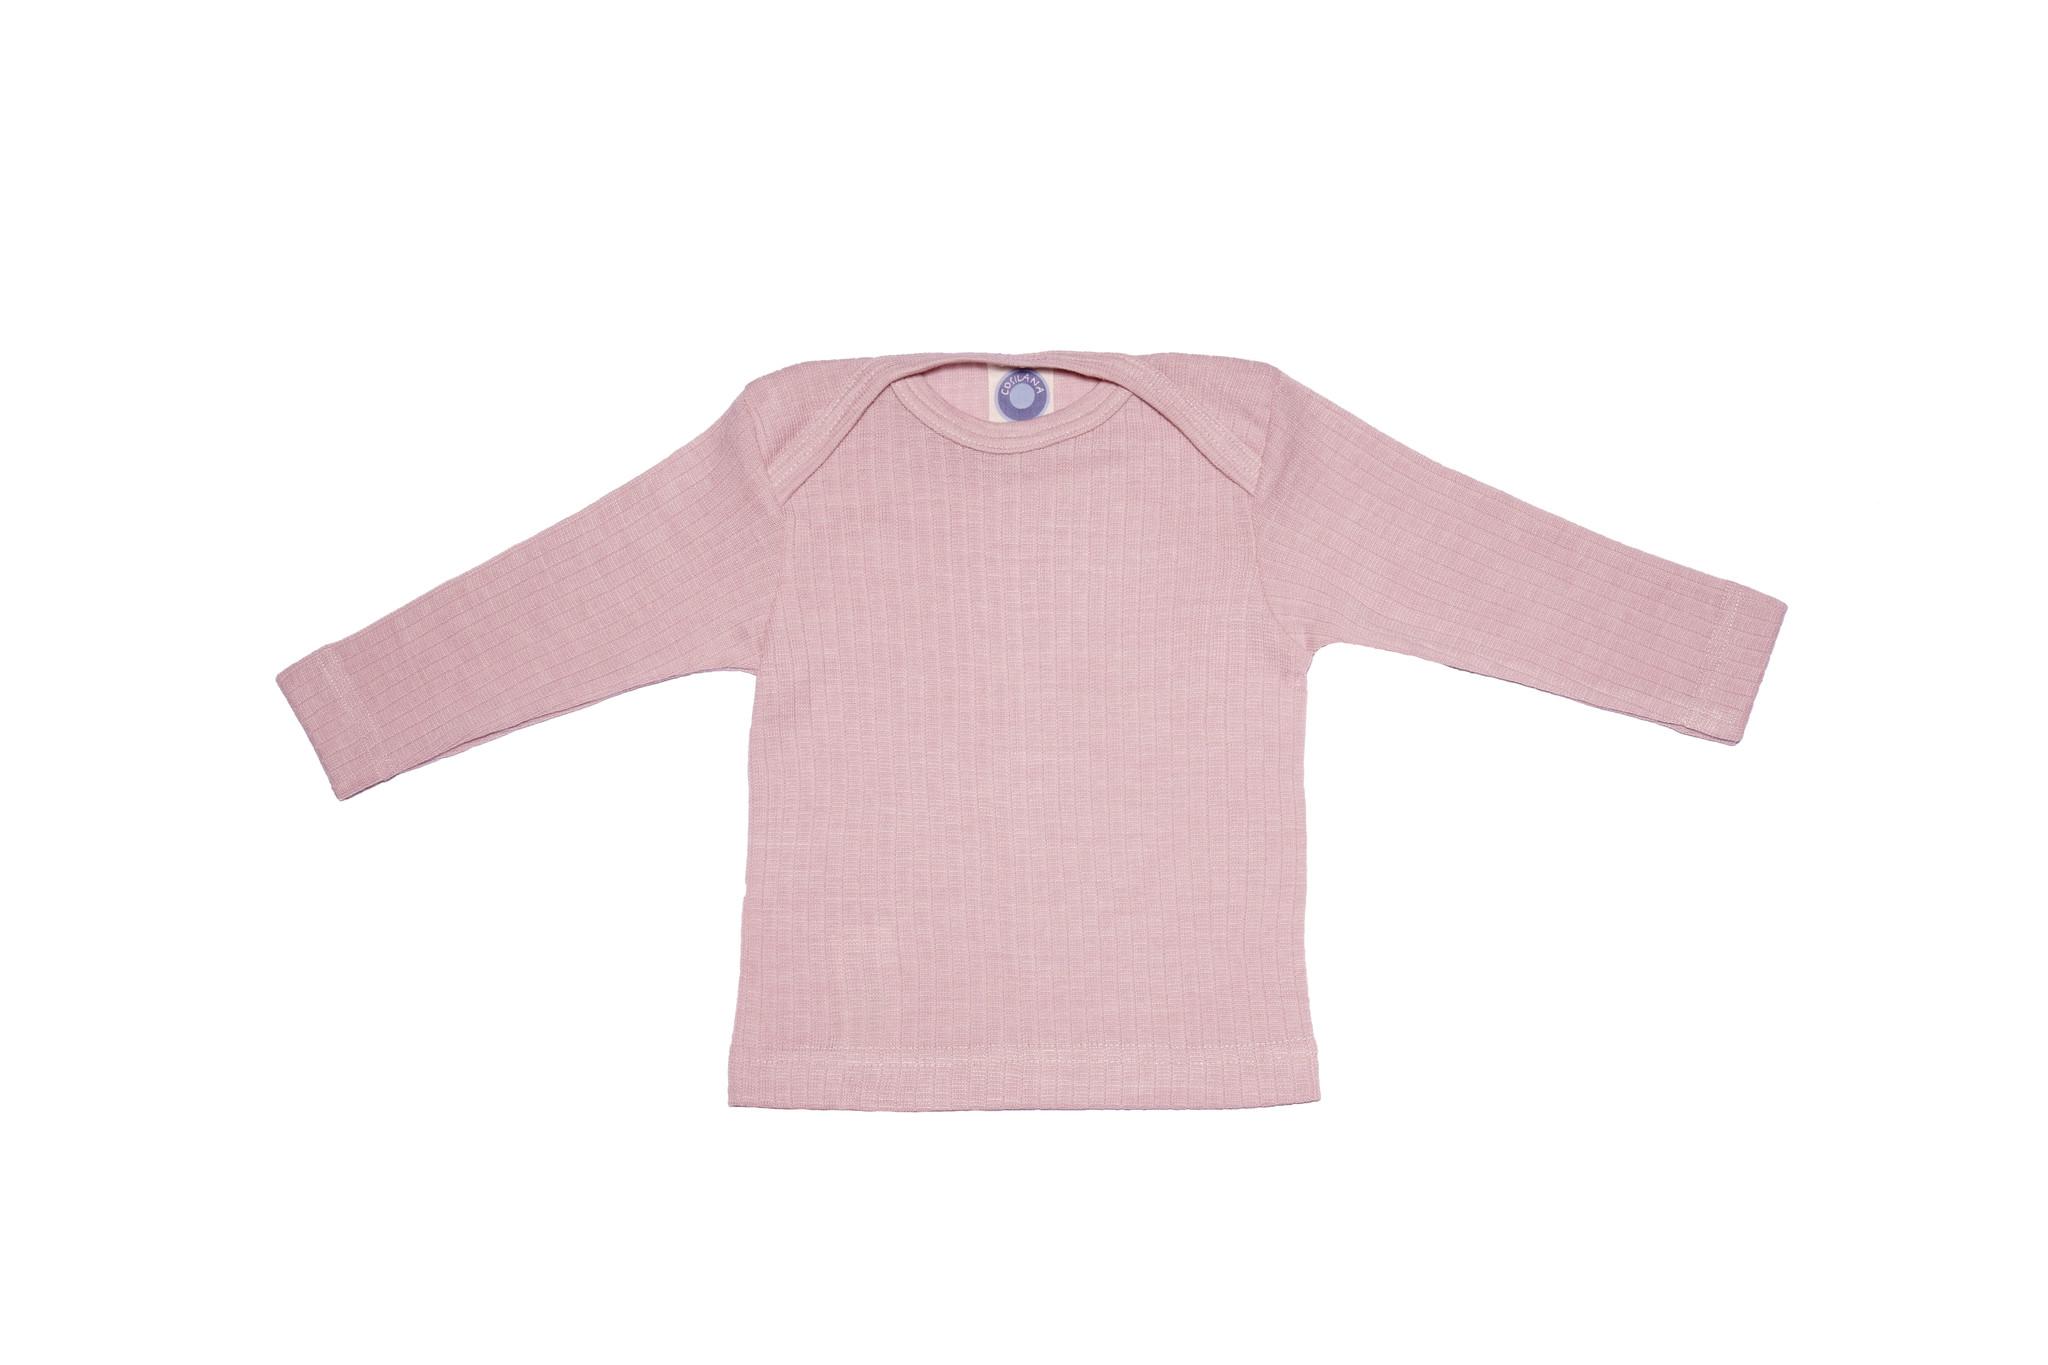 Cosilana Cosilana Babyhemdje Wol/Zijde/Katoen lange mouw - Roze gemeleerd (62)